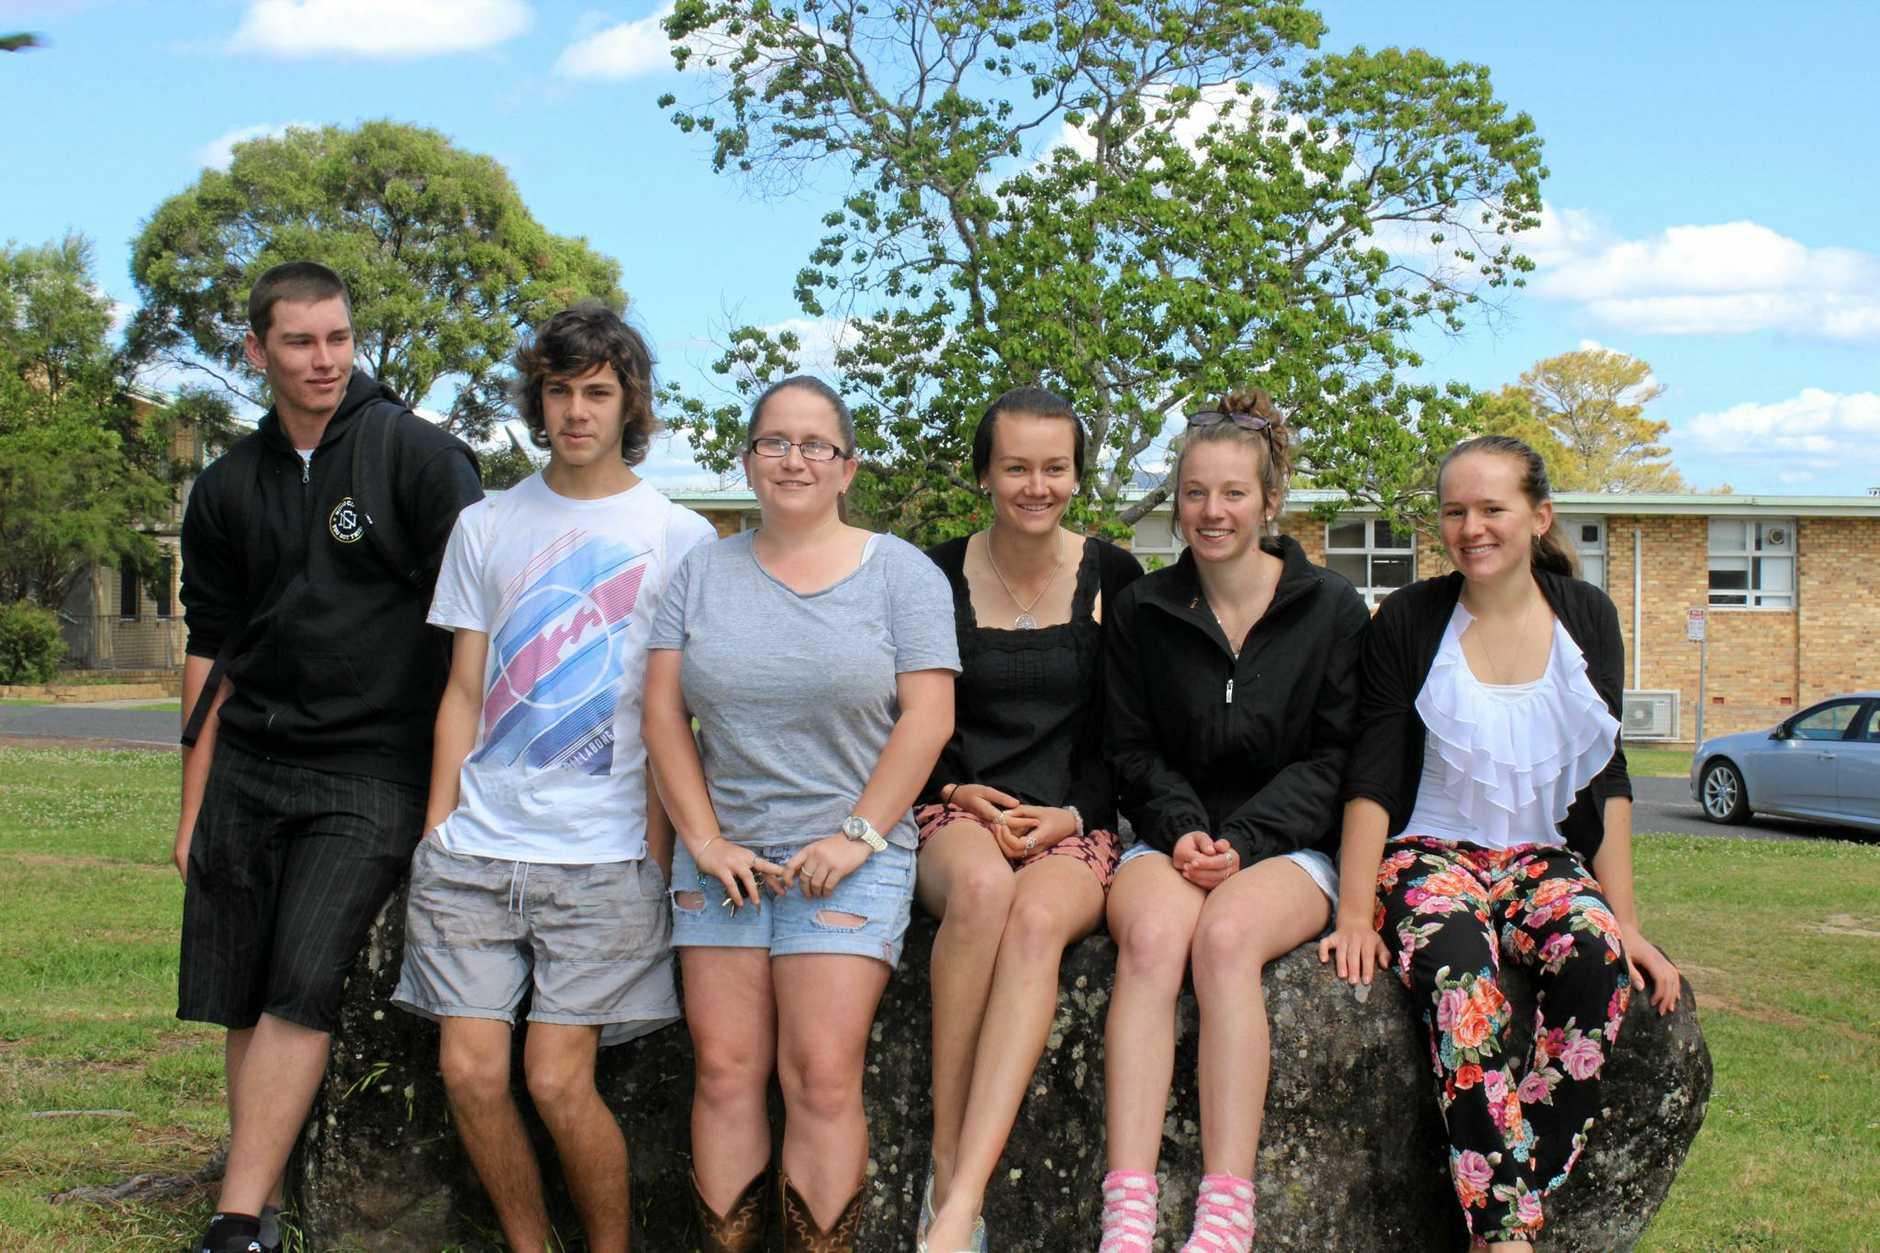 STUDY MODE: Woodenbong Central School students Curtis Flint, Nick Easton, Casey Smith, Billie Reid, Brooke Byrns and Madeleine Barrett.